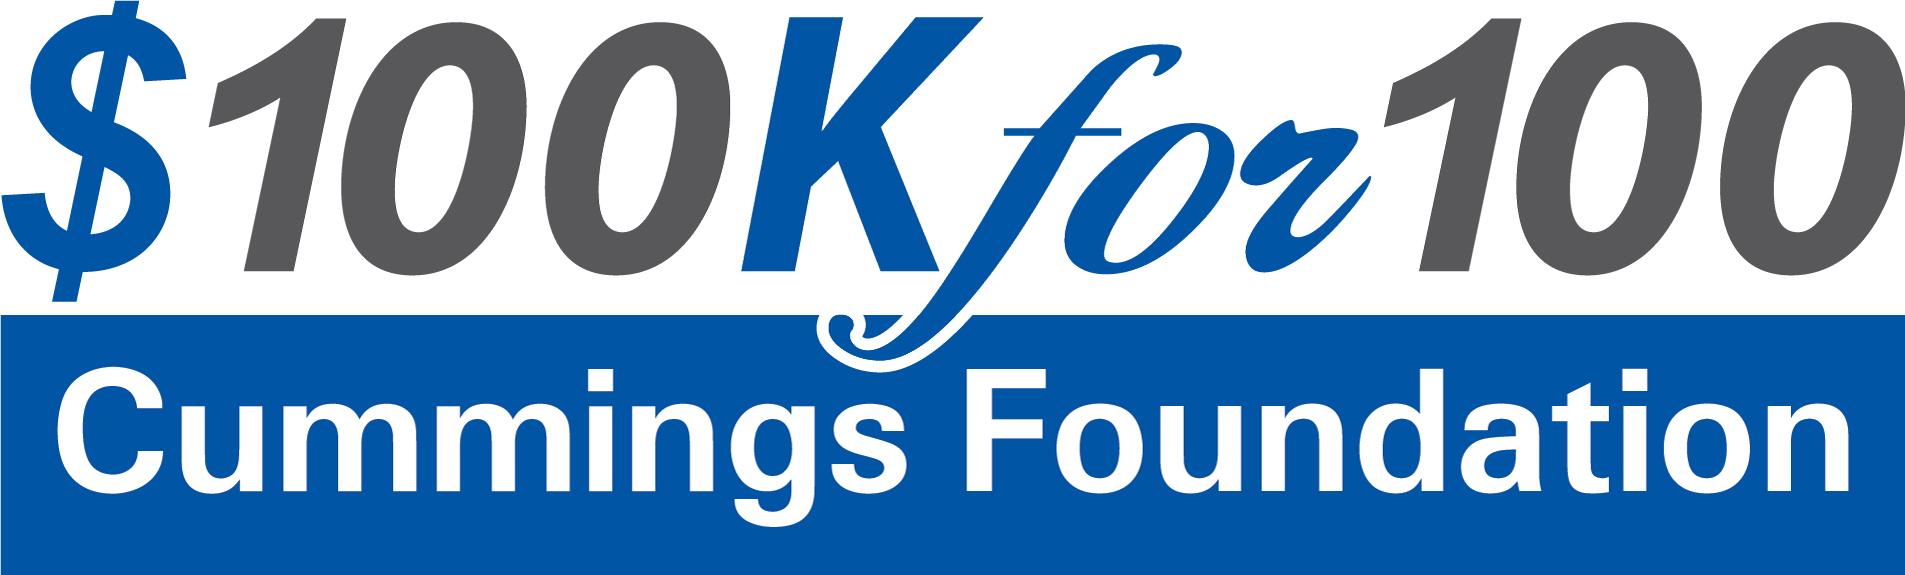 100Kfor100_logo